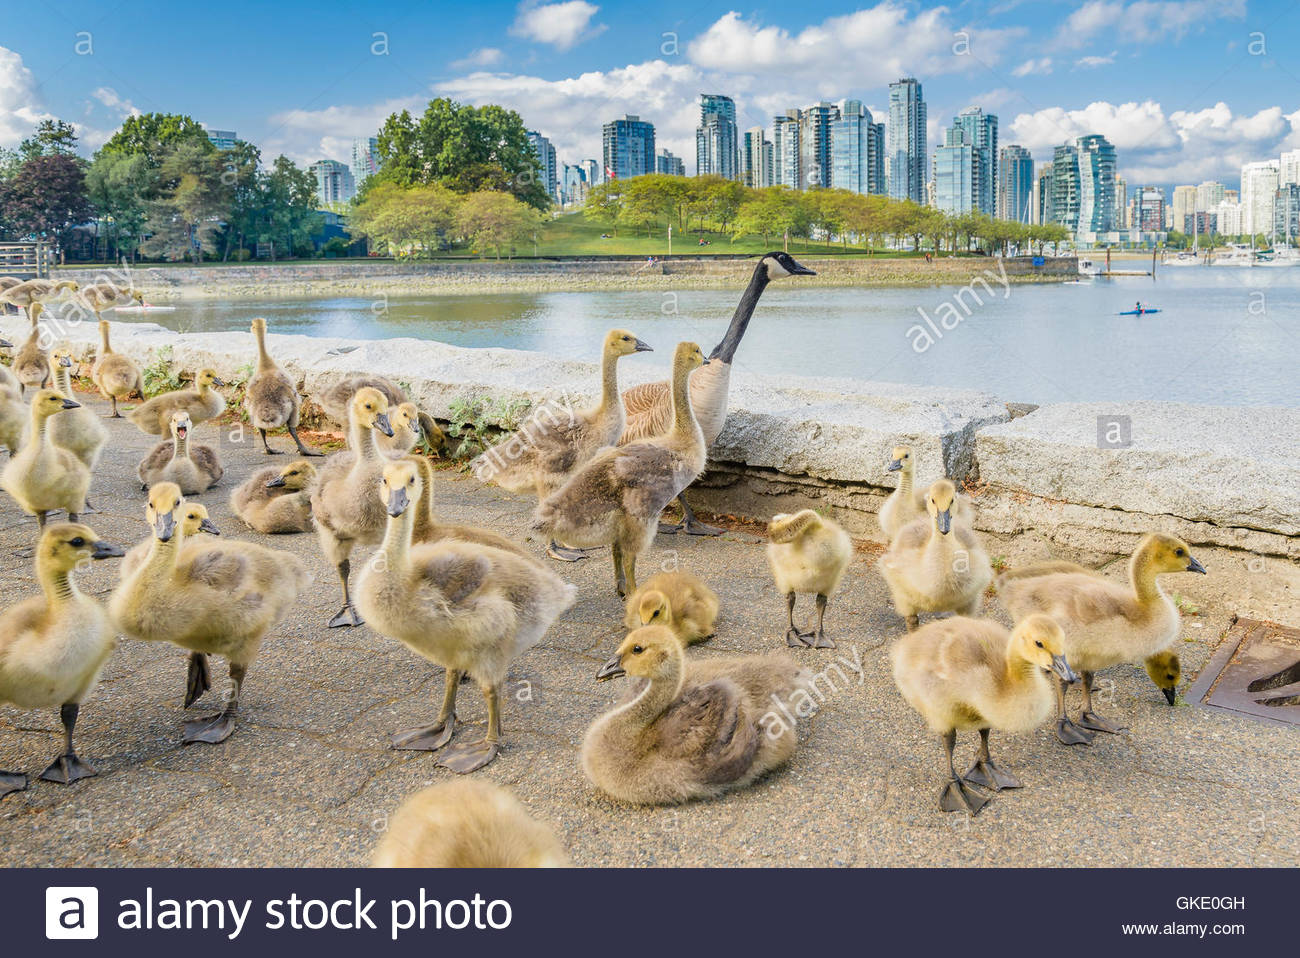 Canada Geese families at False Creek seawall, Vancouver, British Columbia, Canada - Stock Image